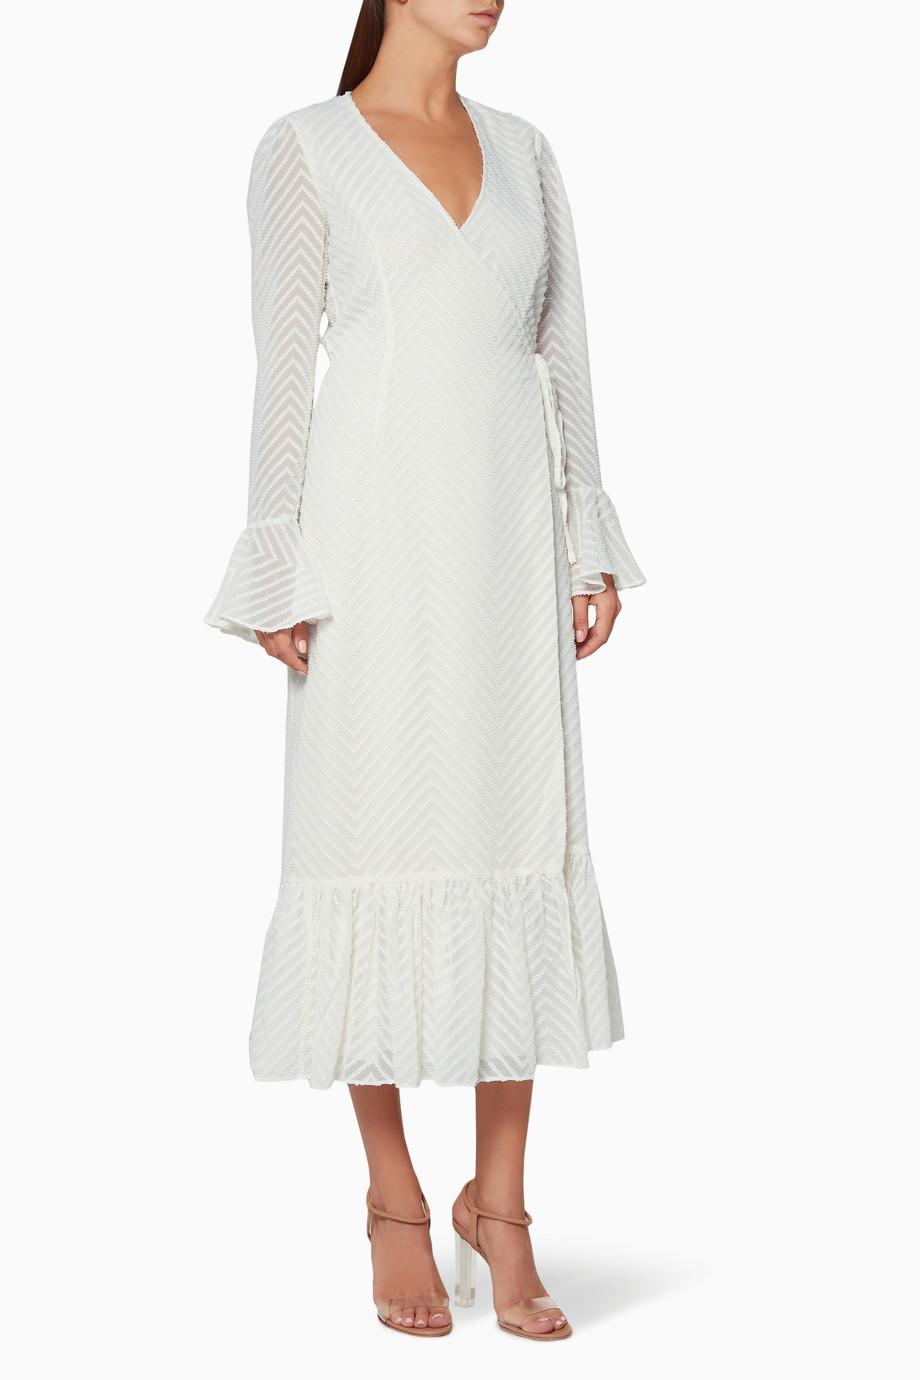 a78a3476d24 Shop SHONA JOY Neutral Ivory Jean Wrap Midi Dress for Women ...